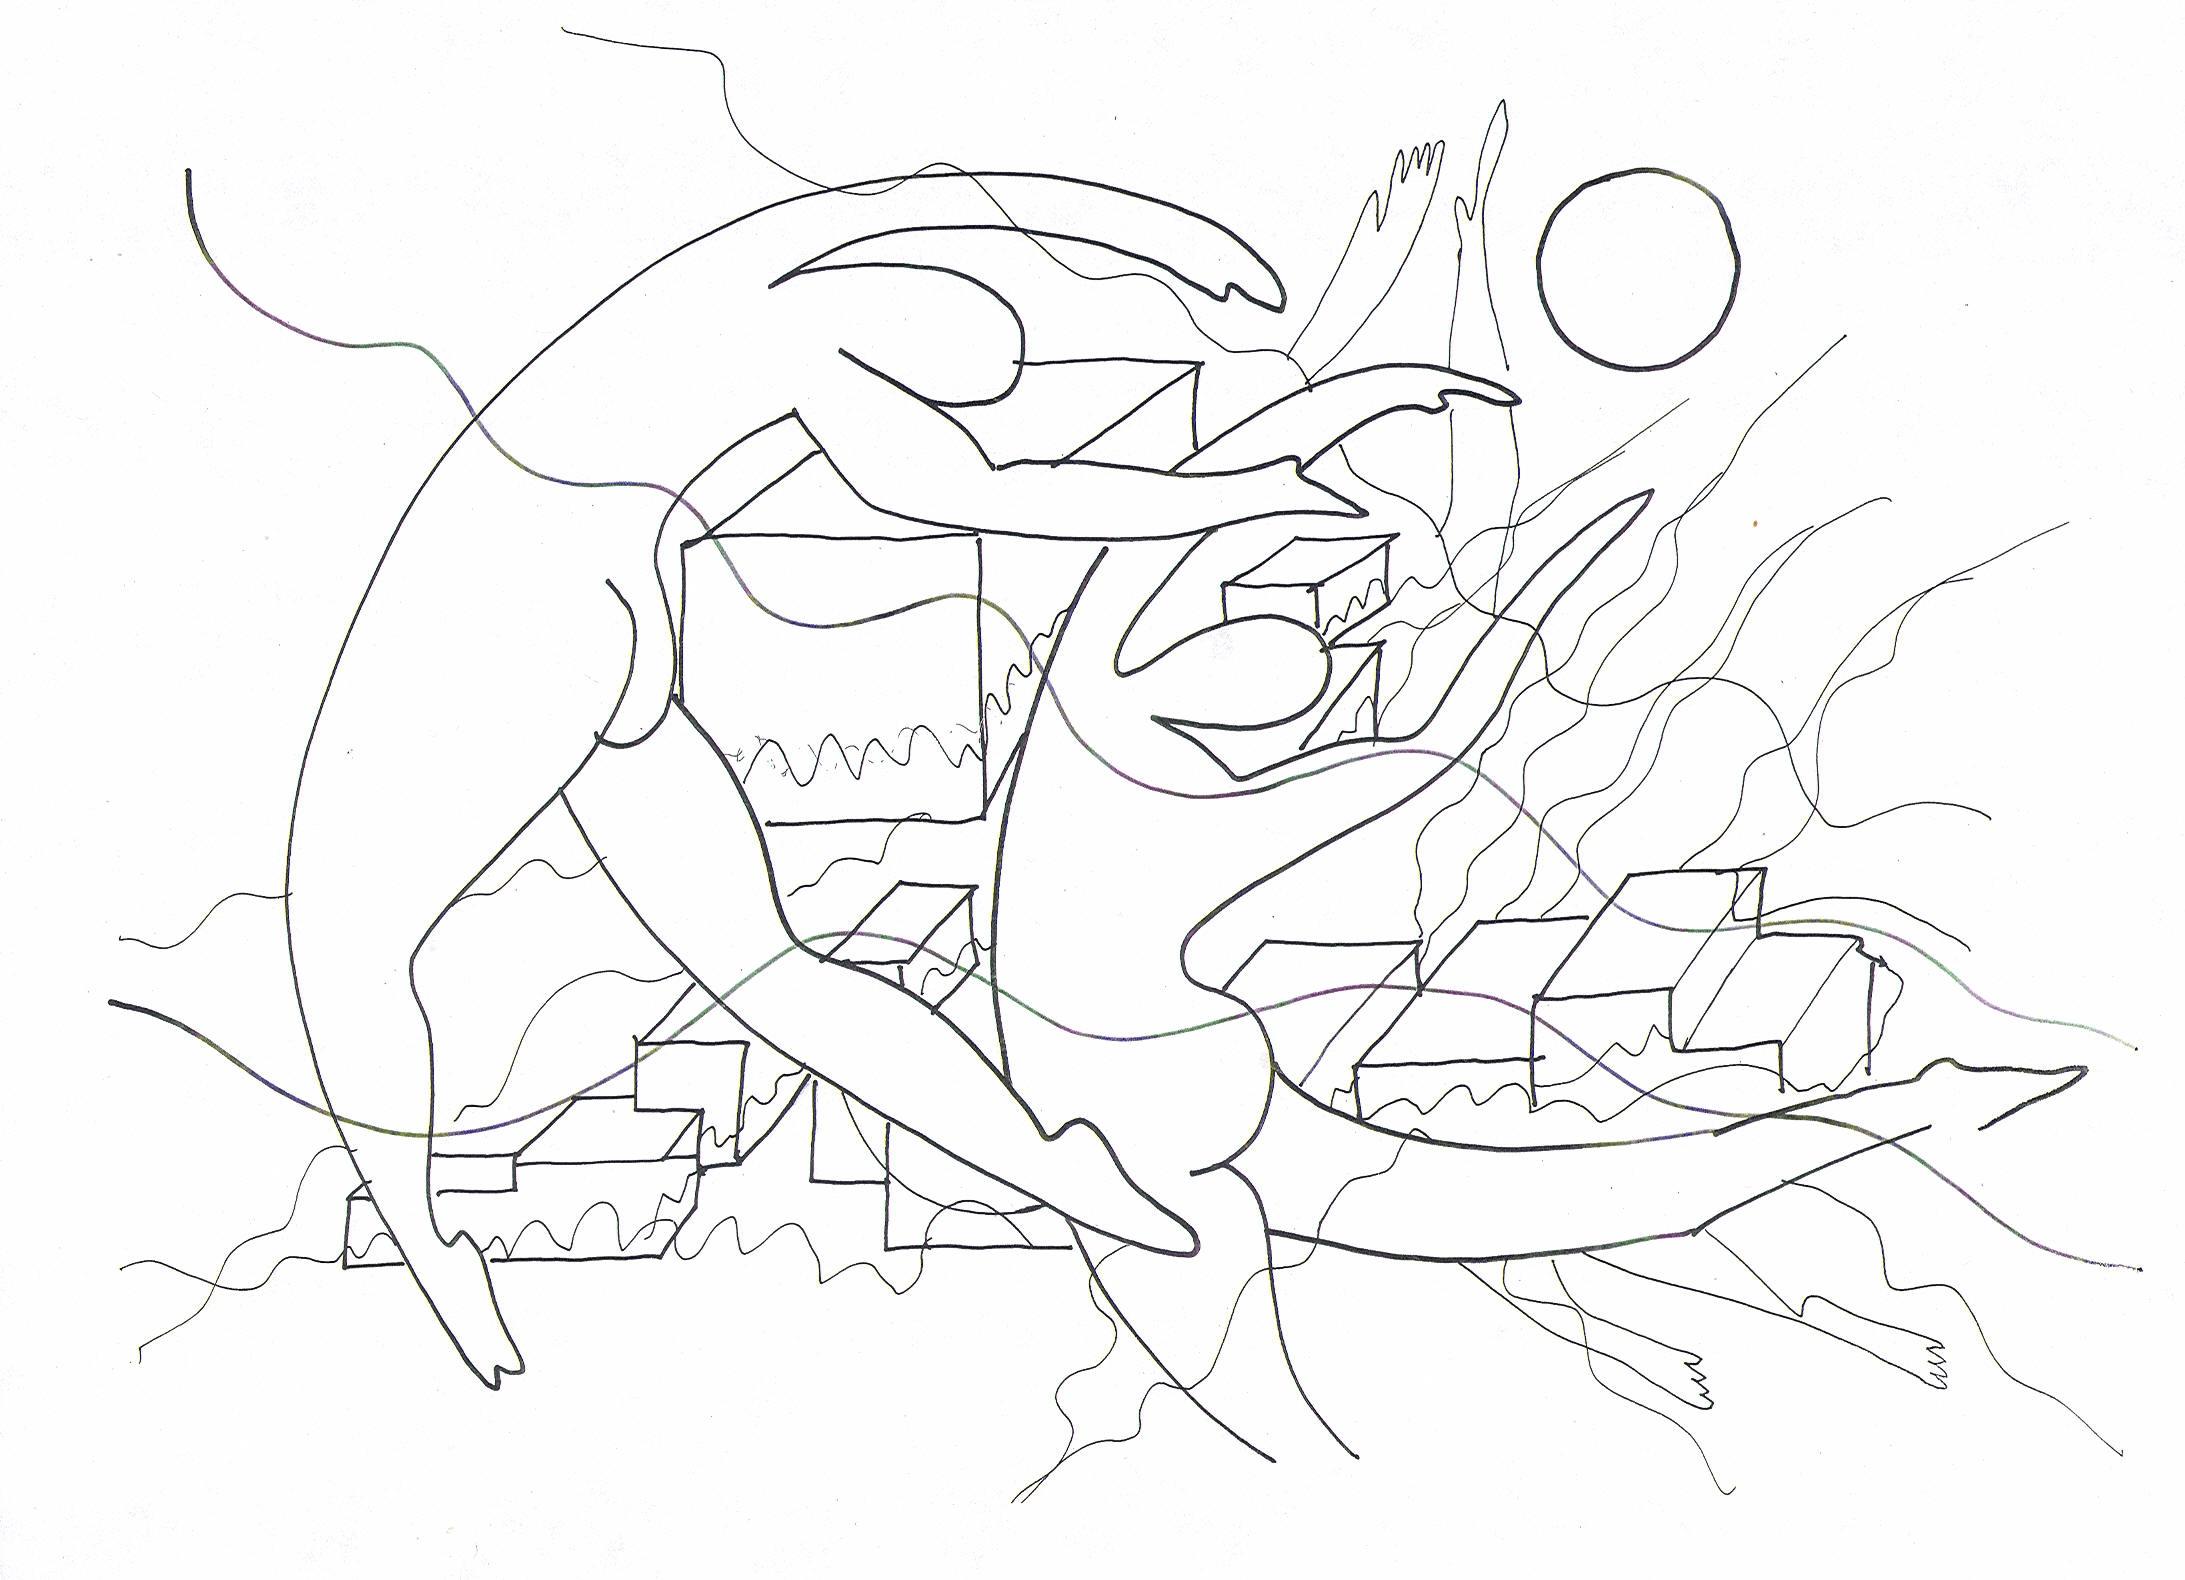 Tsunami 2 sketch.jpg